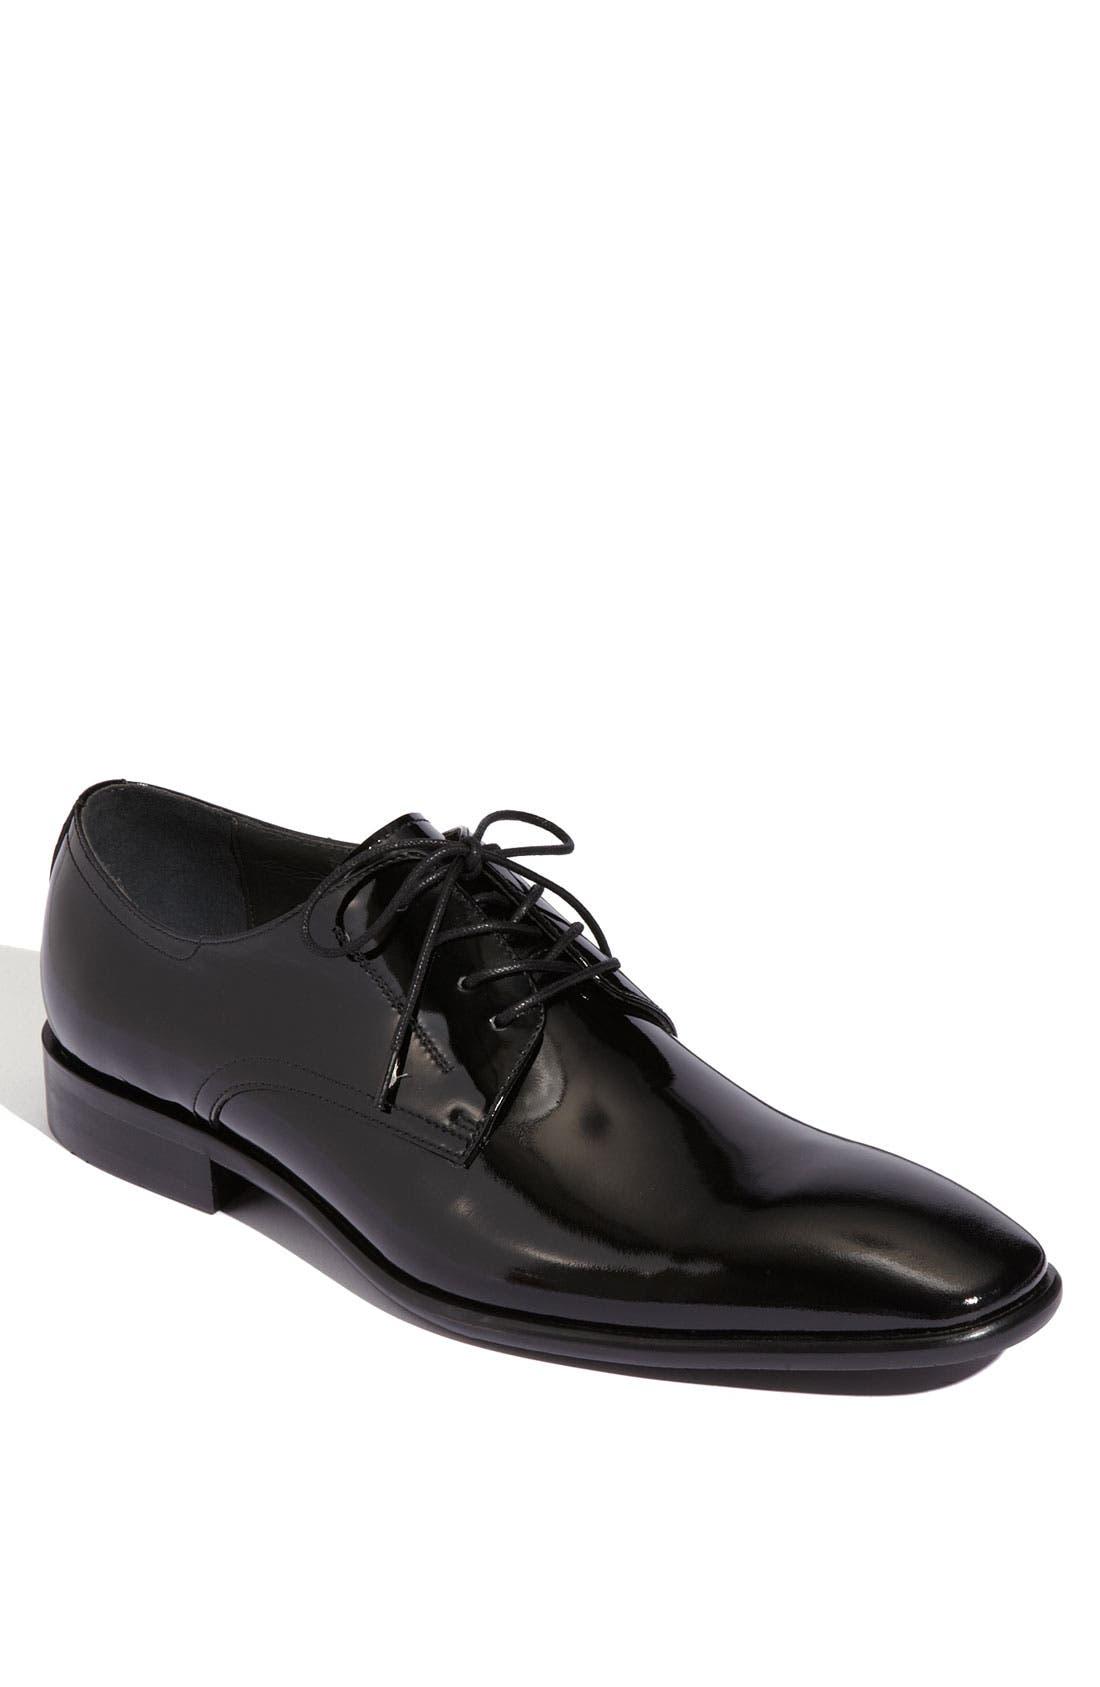 Main Image - Calibrate 'Oscar' Patent Leather Dress Shoe (Men)